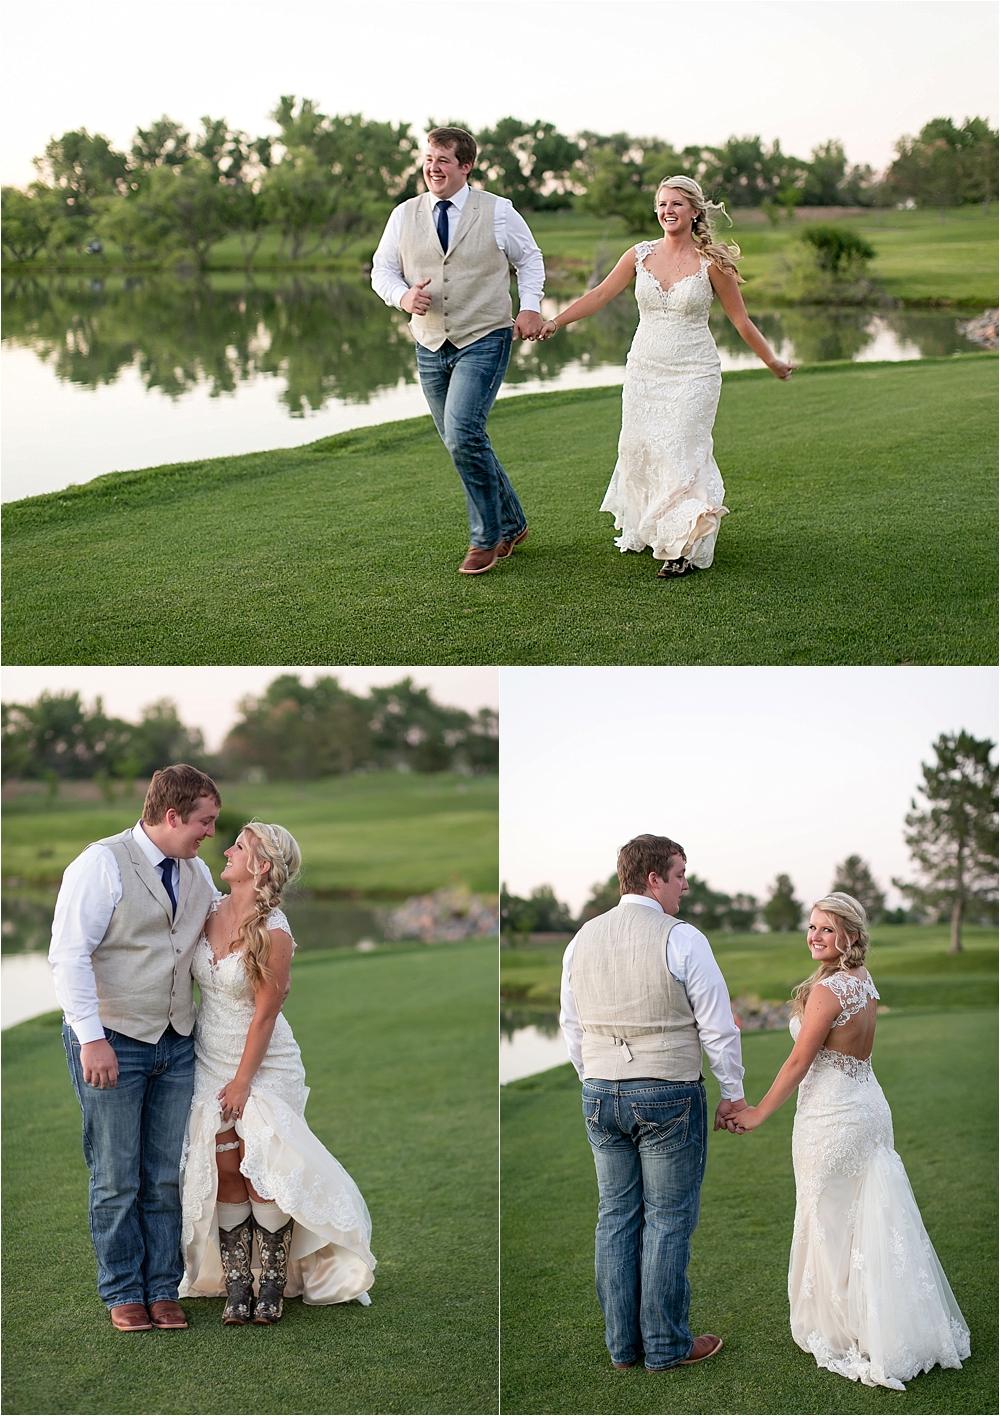 Tessi + Bryce's Raccoon Creek Wedding_0067.jpg